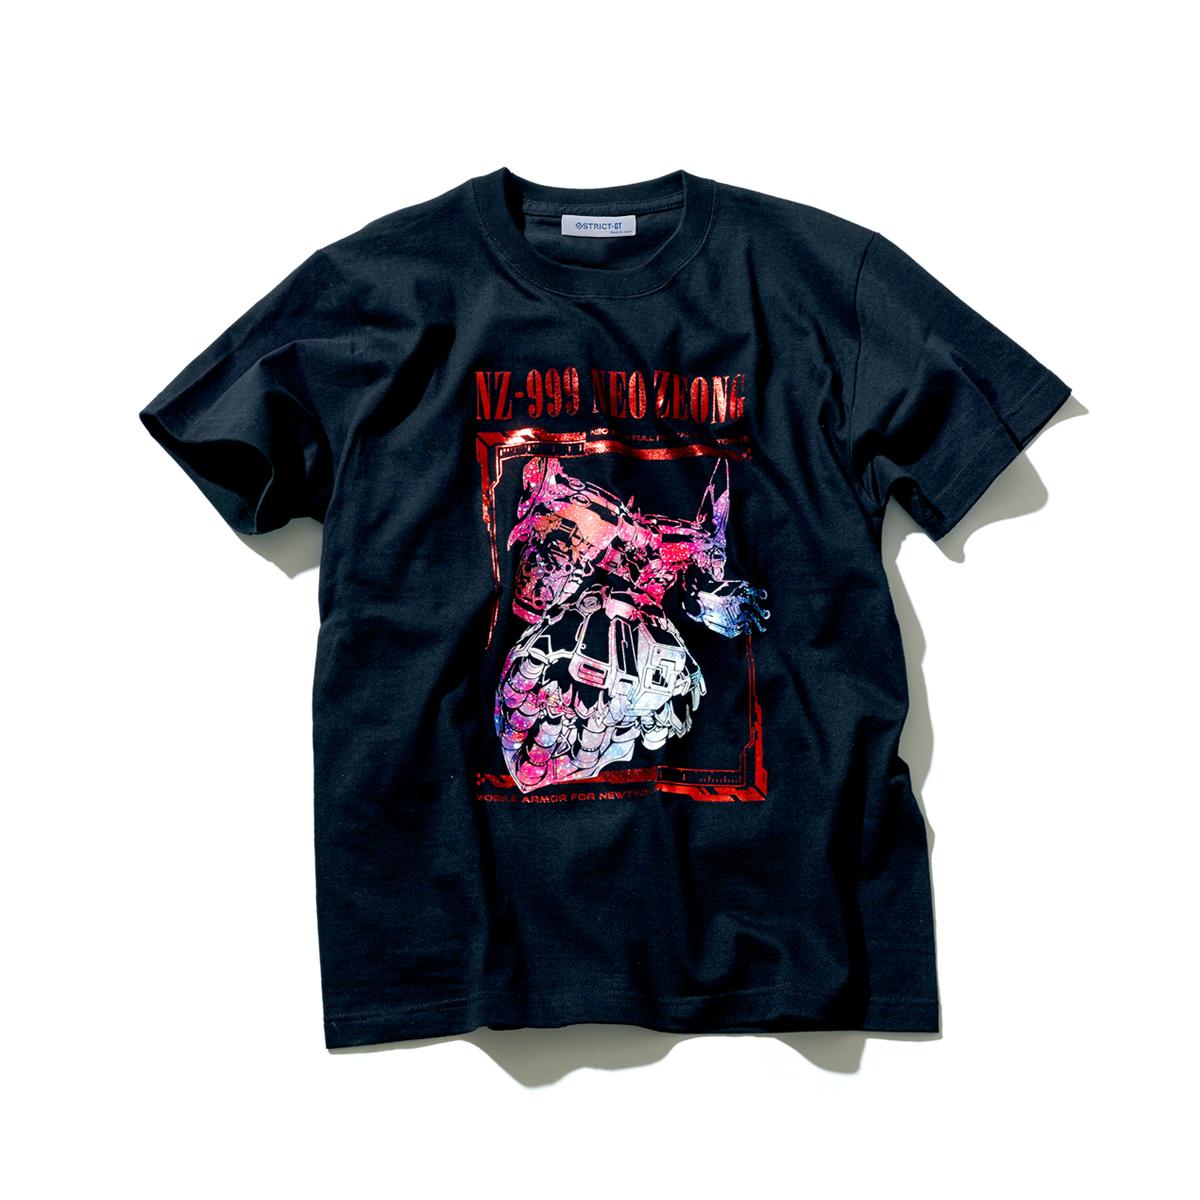 NZ-999 Neo Zeong T-shirt—Mobile Suit Gundam Unicorn